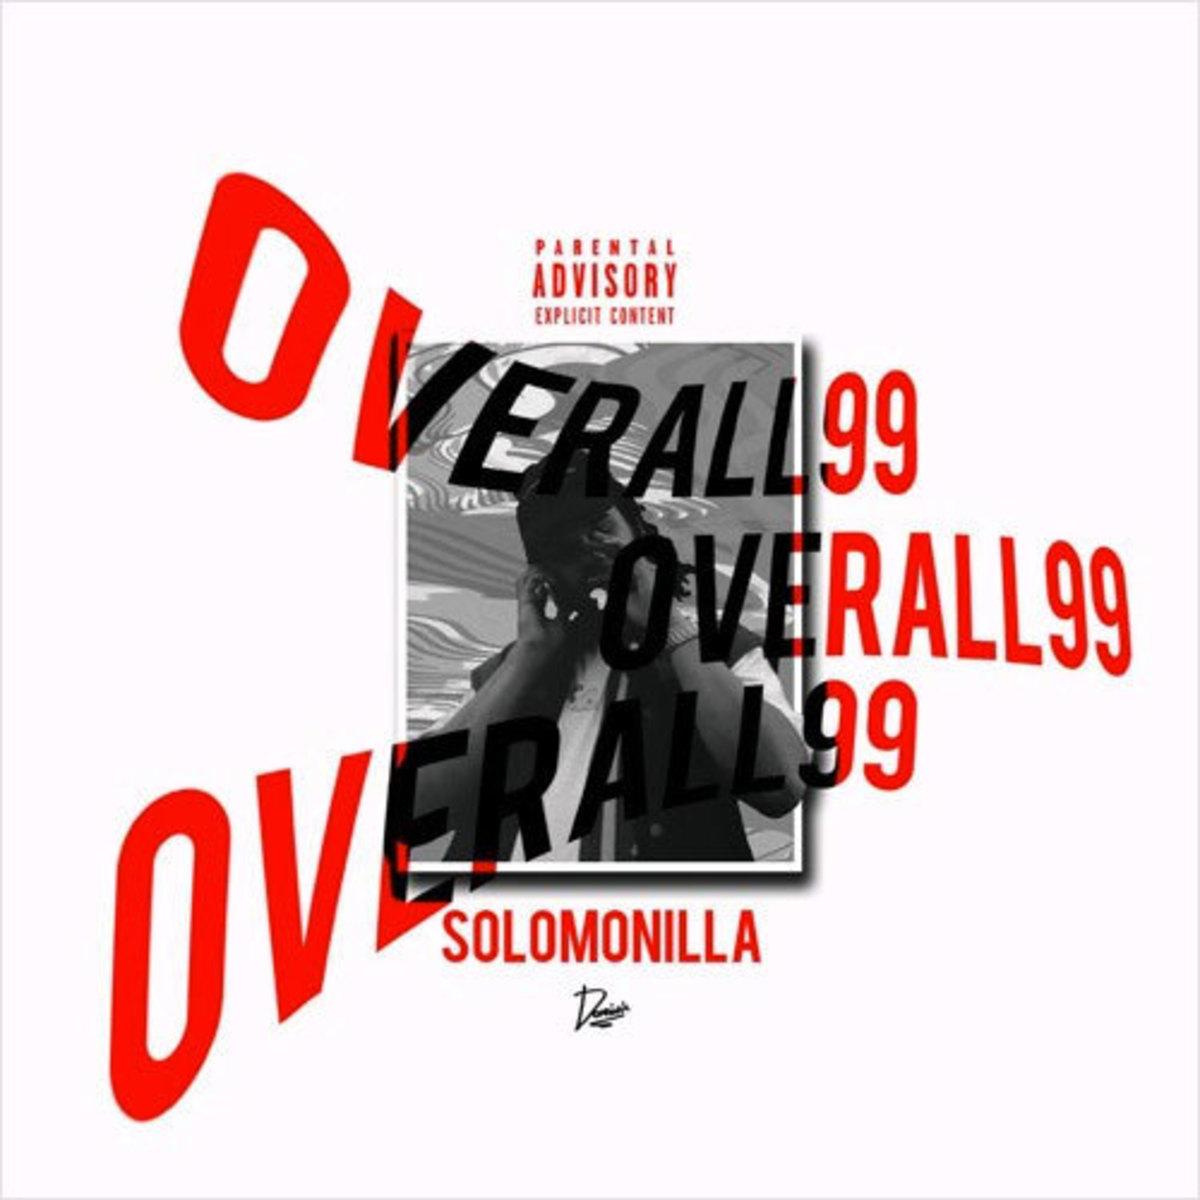 solomonilla-the-forreal.jpg